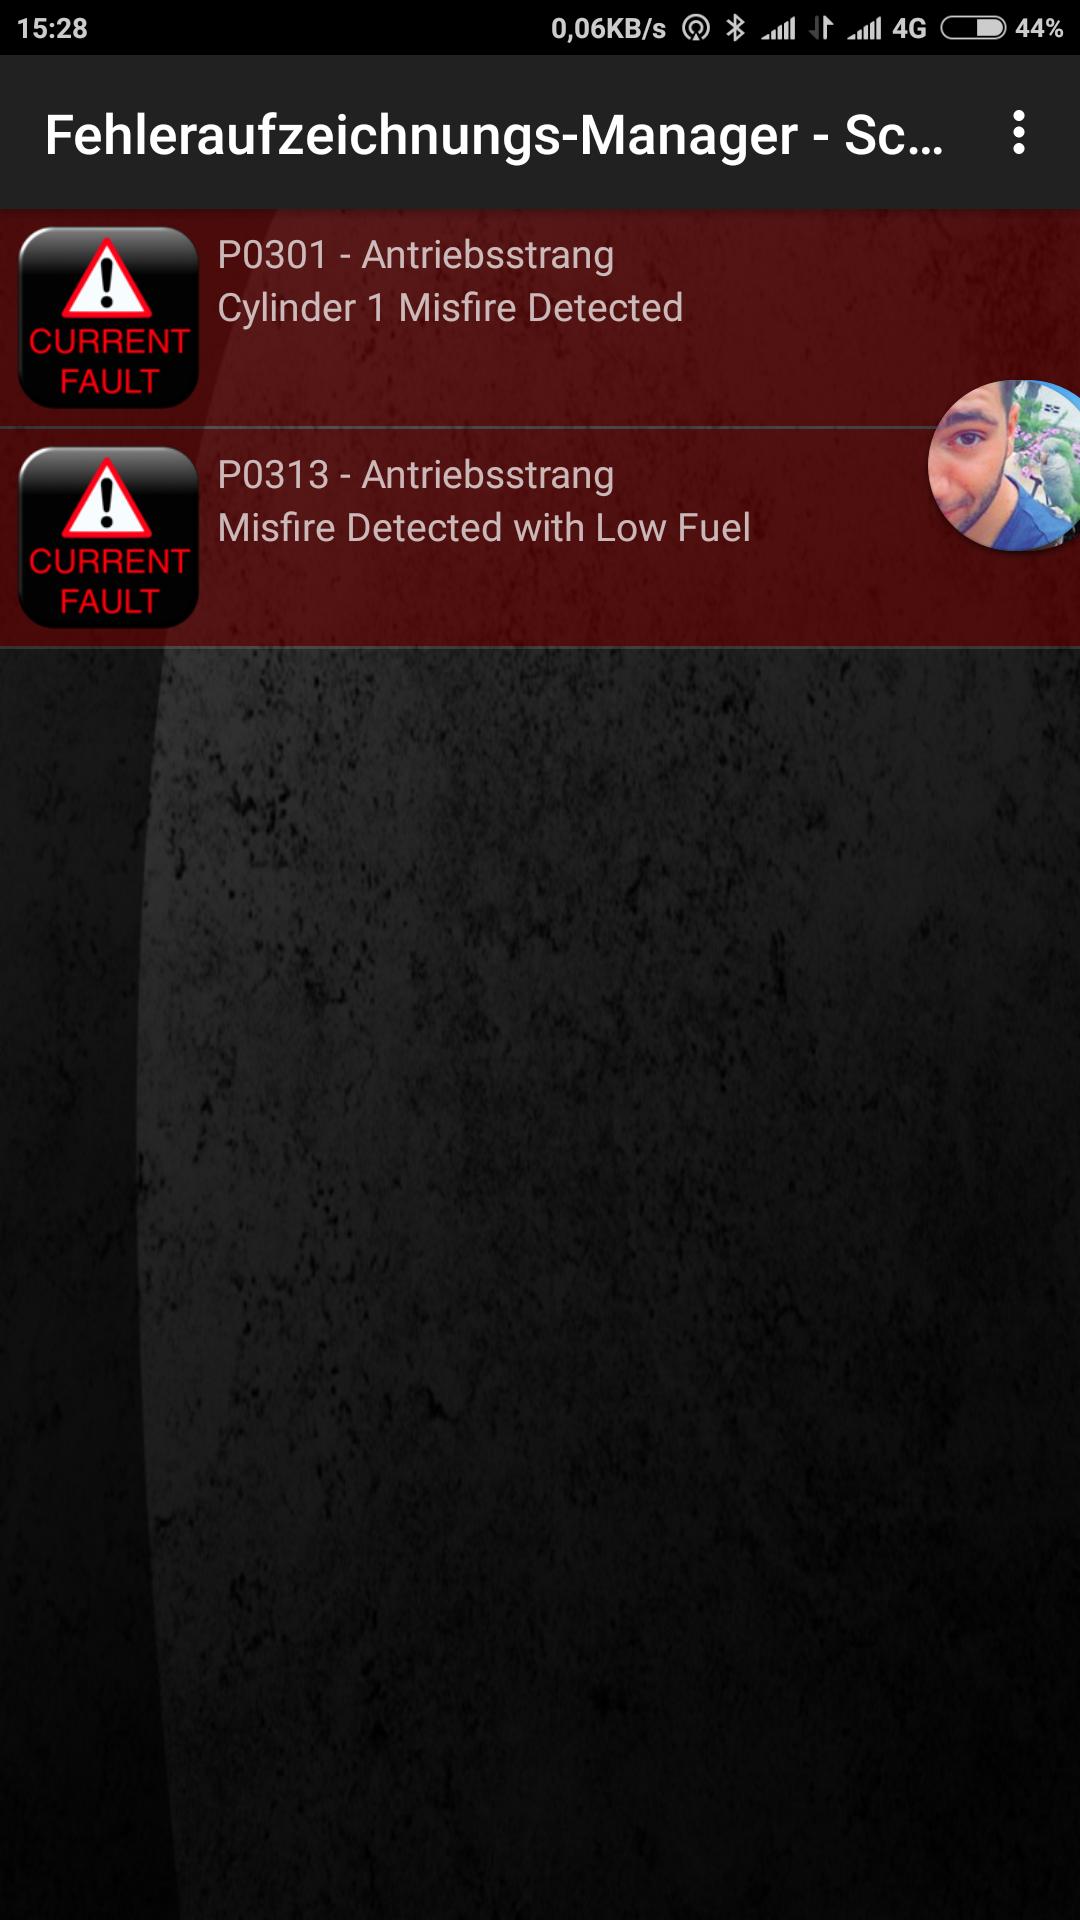 Screenshot_2018-05-10-15-28-58-844_org.prowl.torque.png